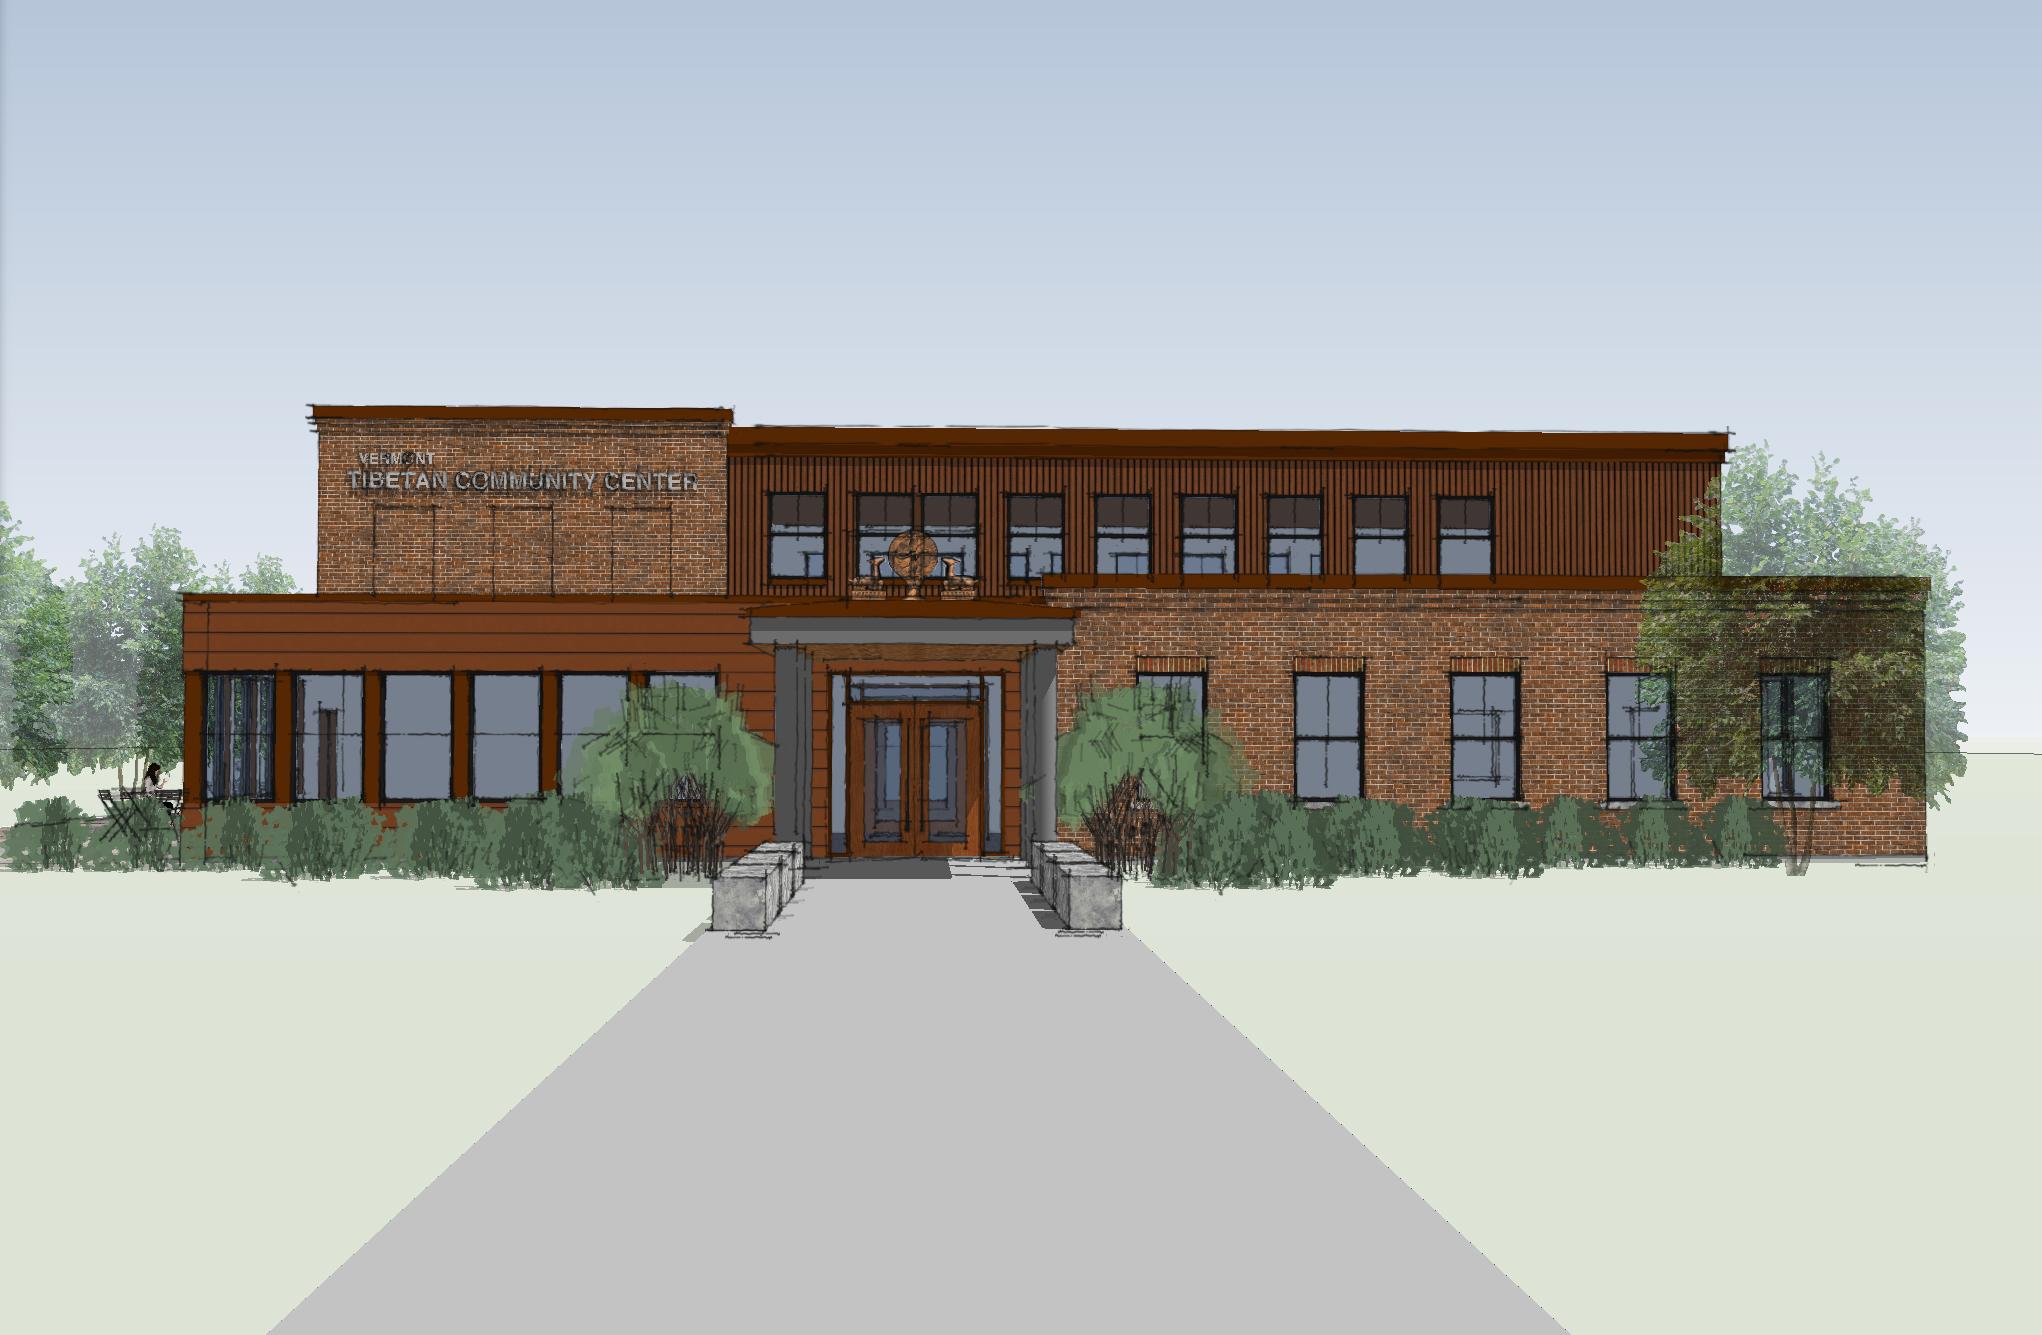 Vermont Tibetan Community Center Project